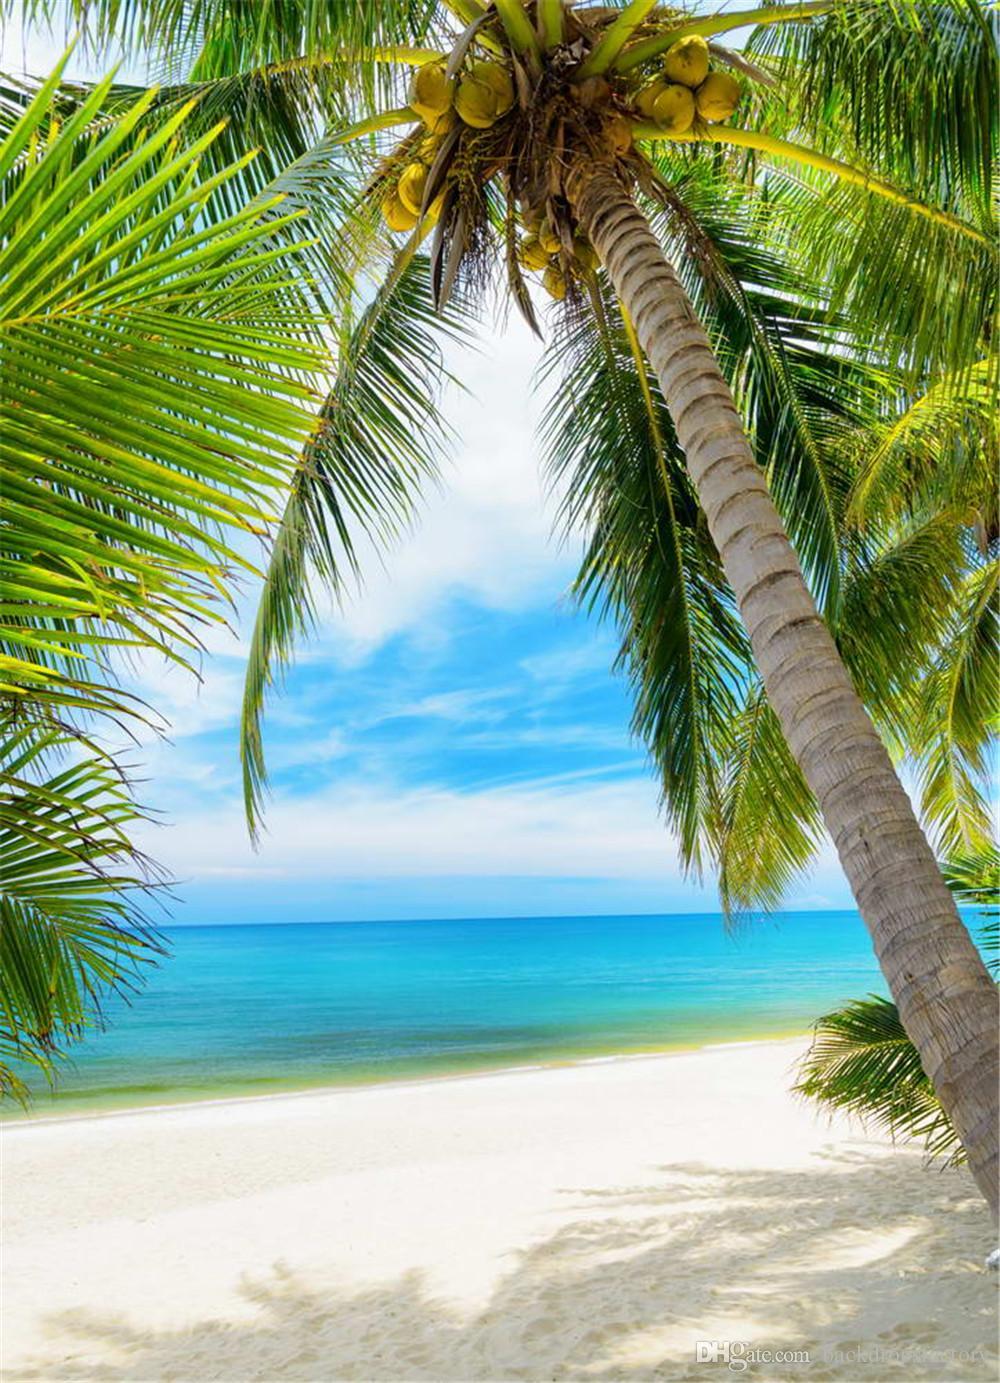 2019 Beautiful Scenery Beach Themed Backdrop Photography ...